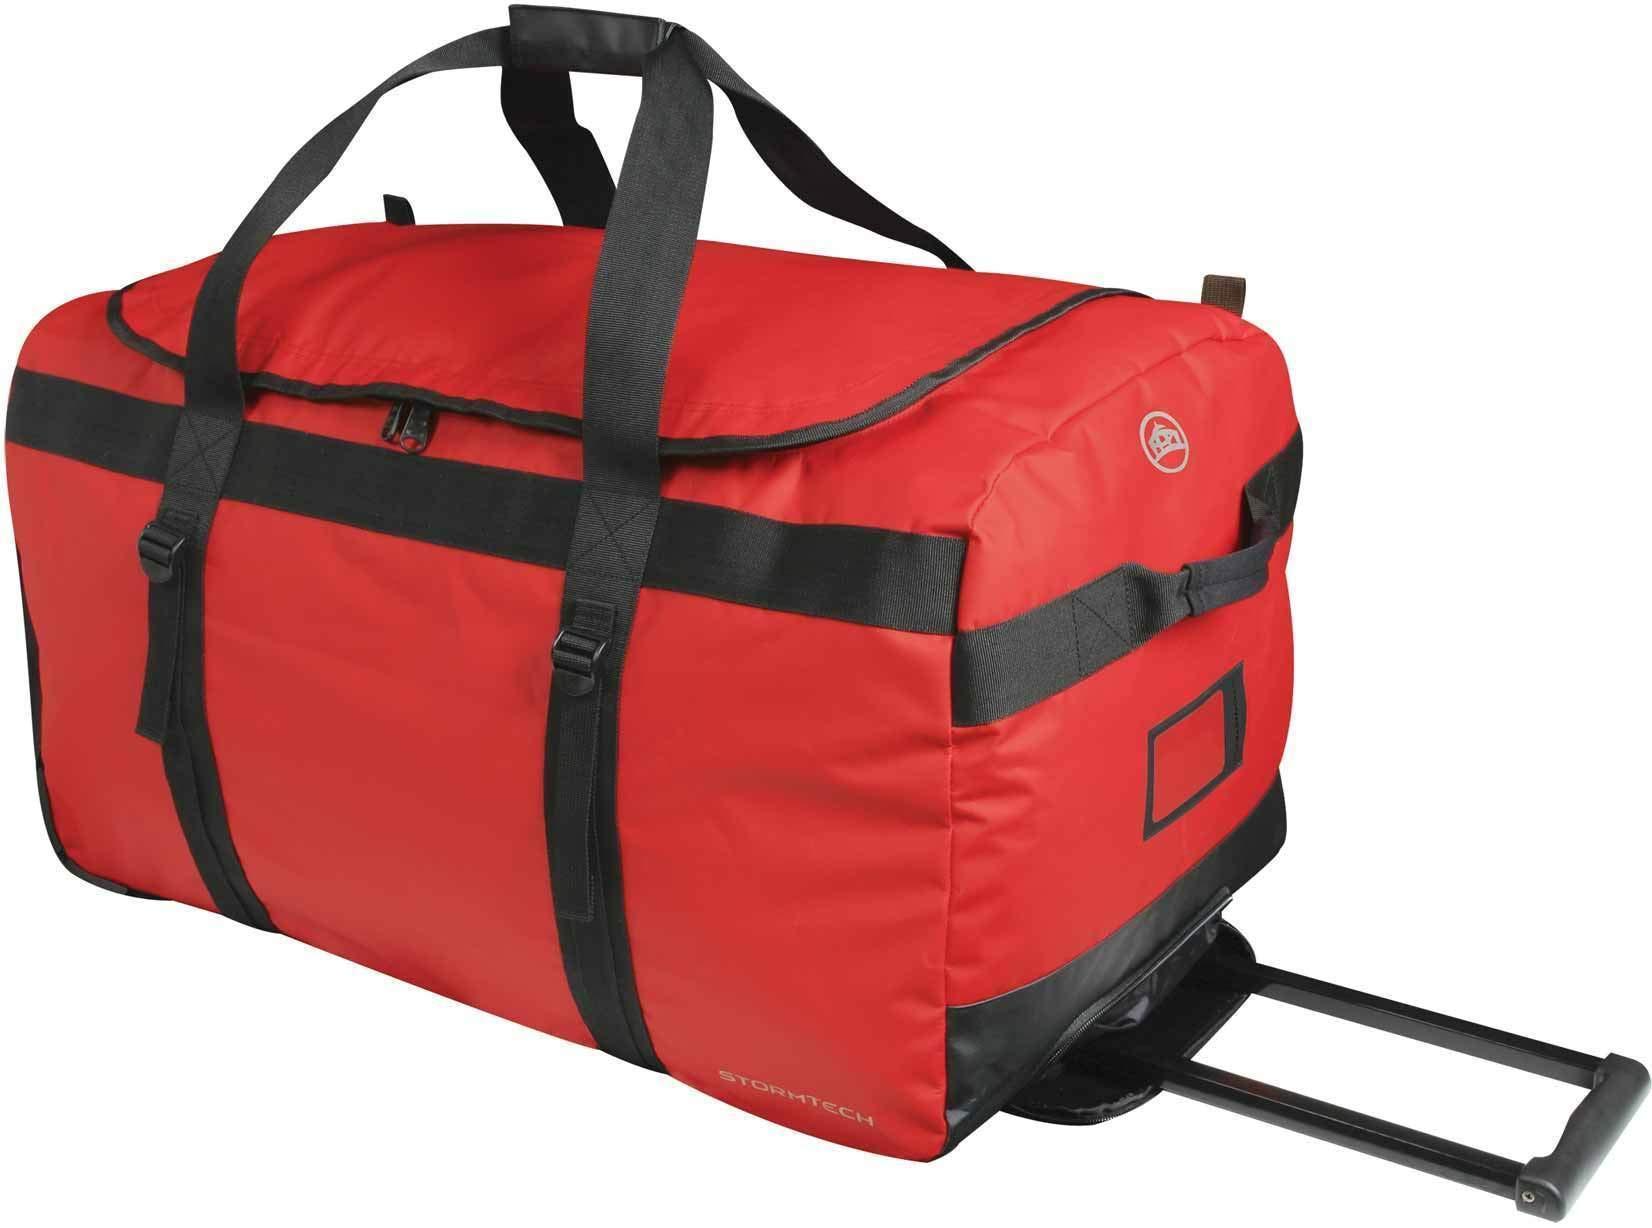 Stormtech Trident Waterproof Rolling Duffel Bag - GBW-2